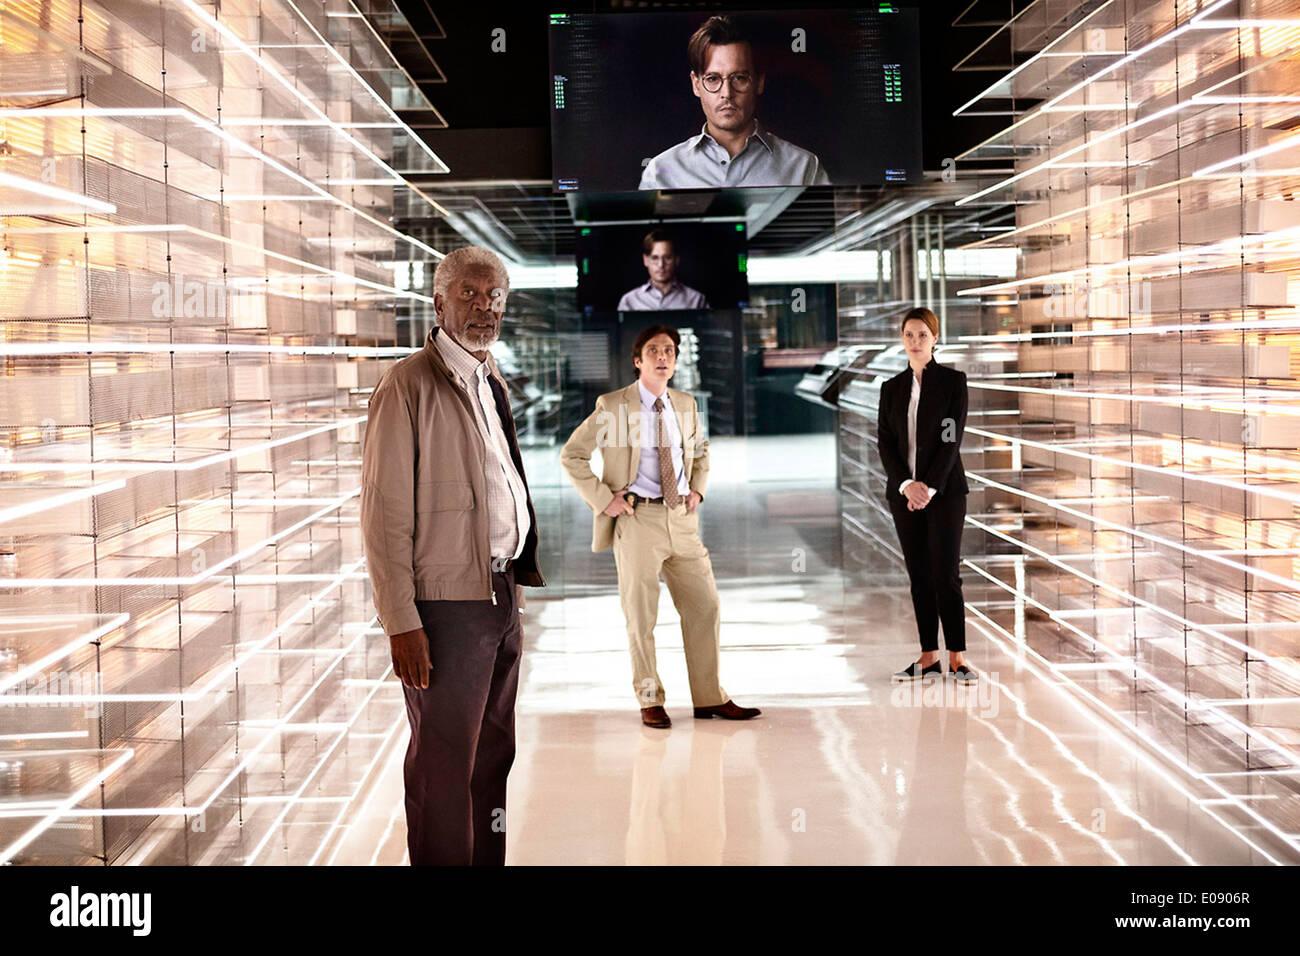 TRANSCENDENCE (2014) MORGAN FREEMAN CILLIAN MURPHY JOHNNY DEPP REBECCA HALL WALLY PFISTER (DIR) MOVIESTORE COLLECTION LTD - Stock Image